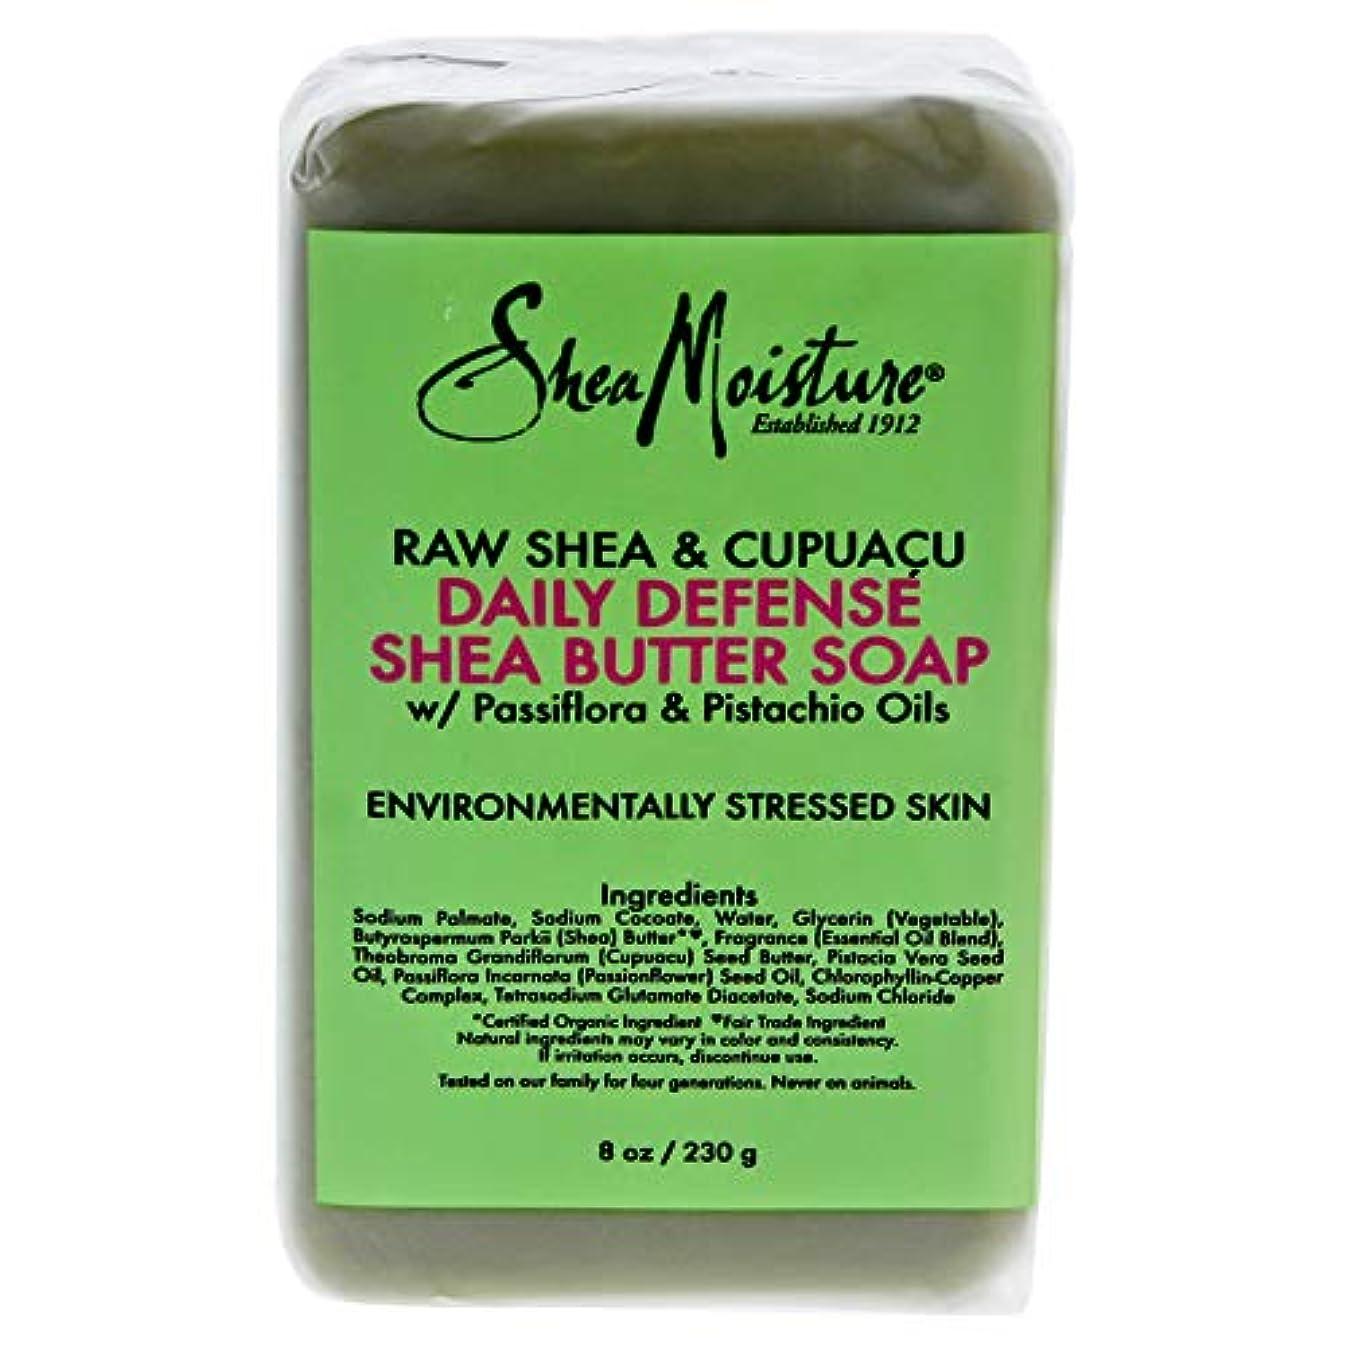 Shea Moisture U-BB-2717 Raw Shea & Cupuacu Daily Defense Shea Butter Soap for Unisex - 8 oz